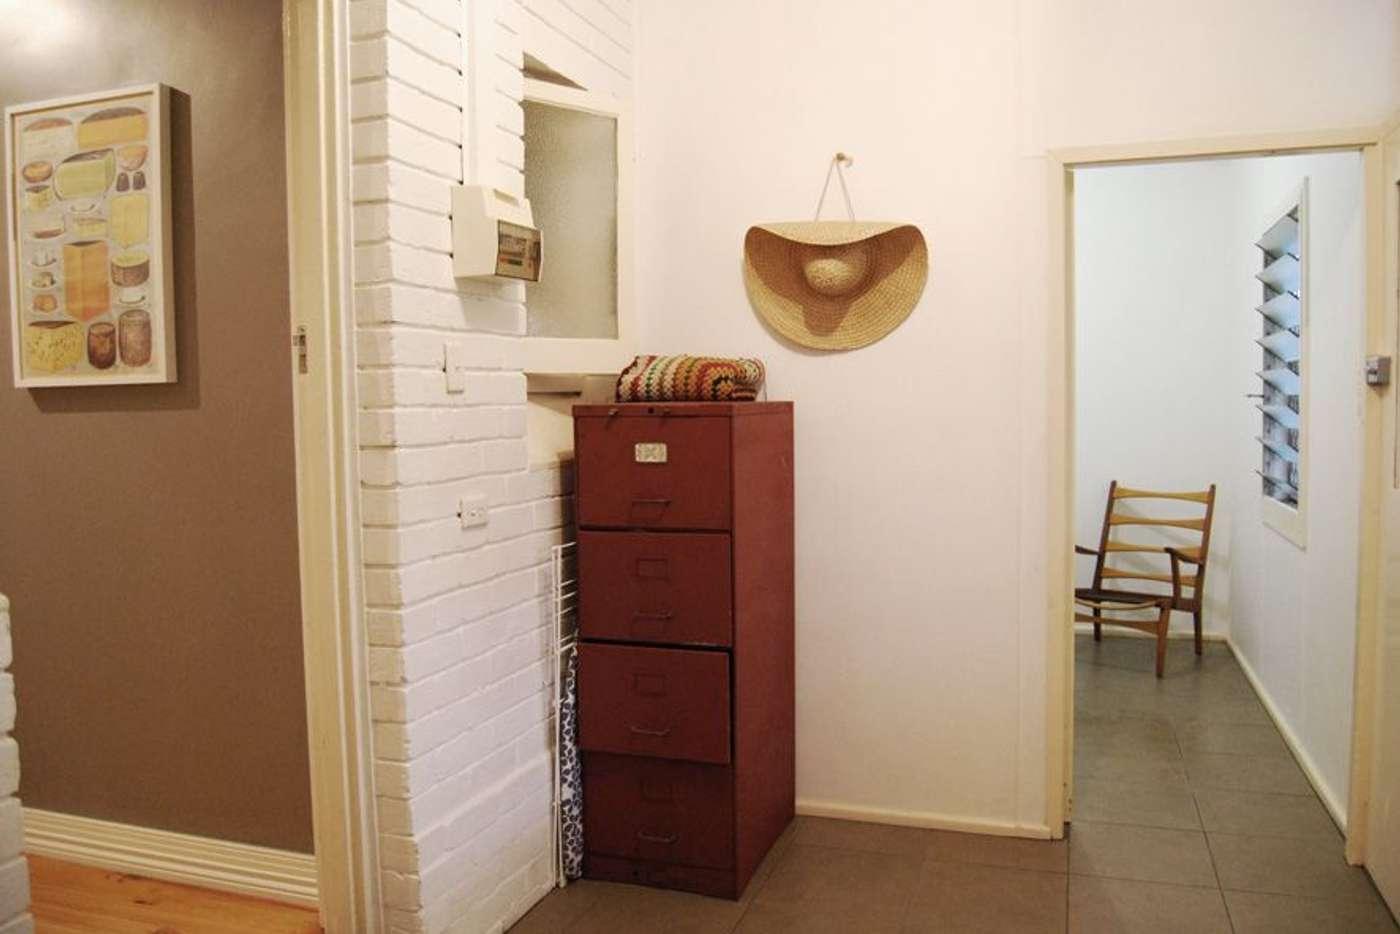 Sixth view of Homely house listing, 18 Vincent Street, South Plympton SA 5038